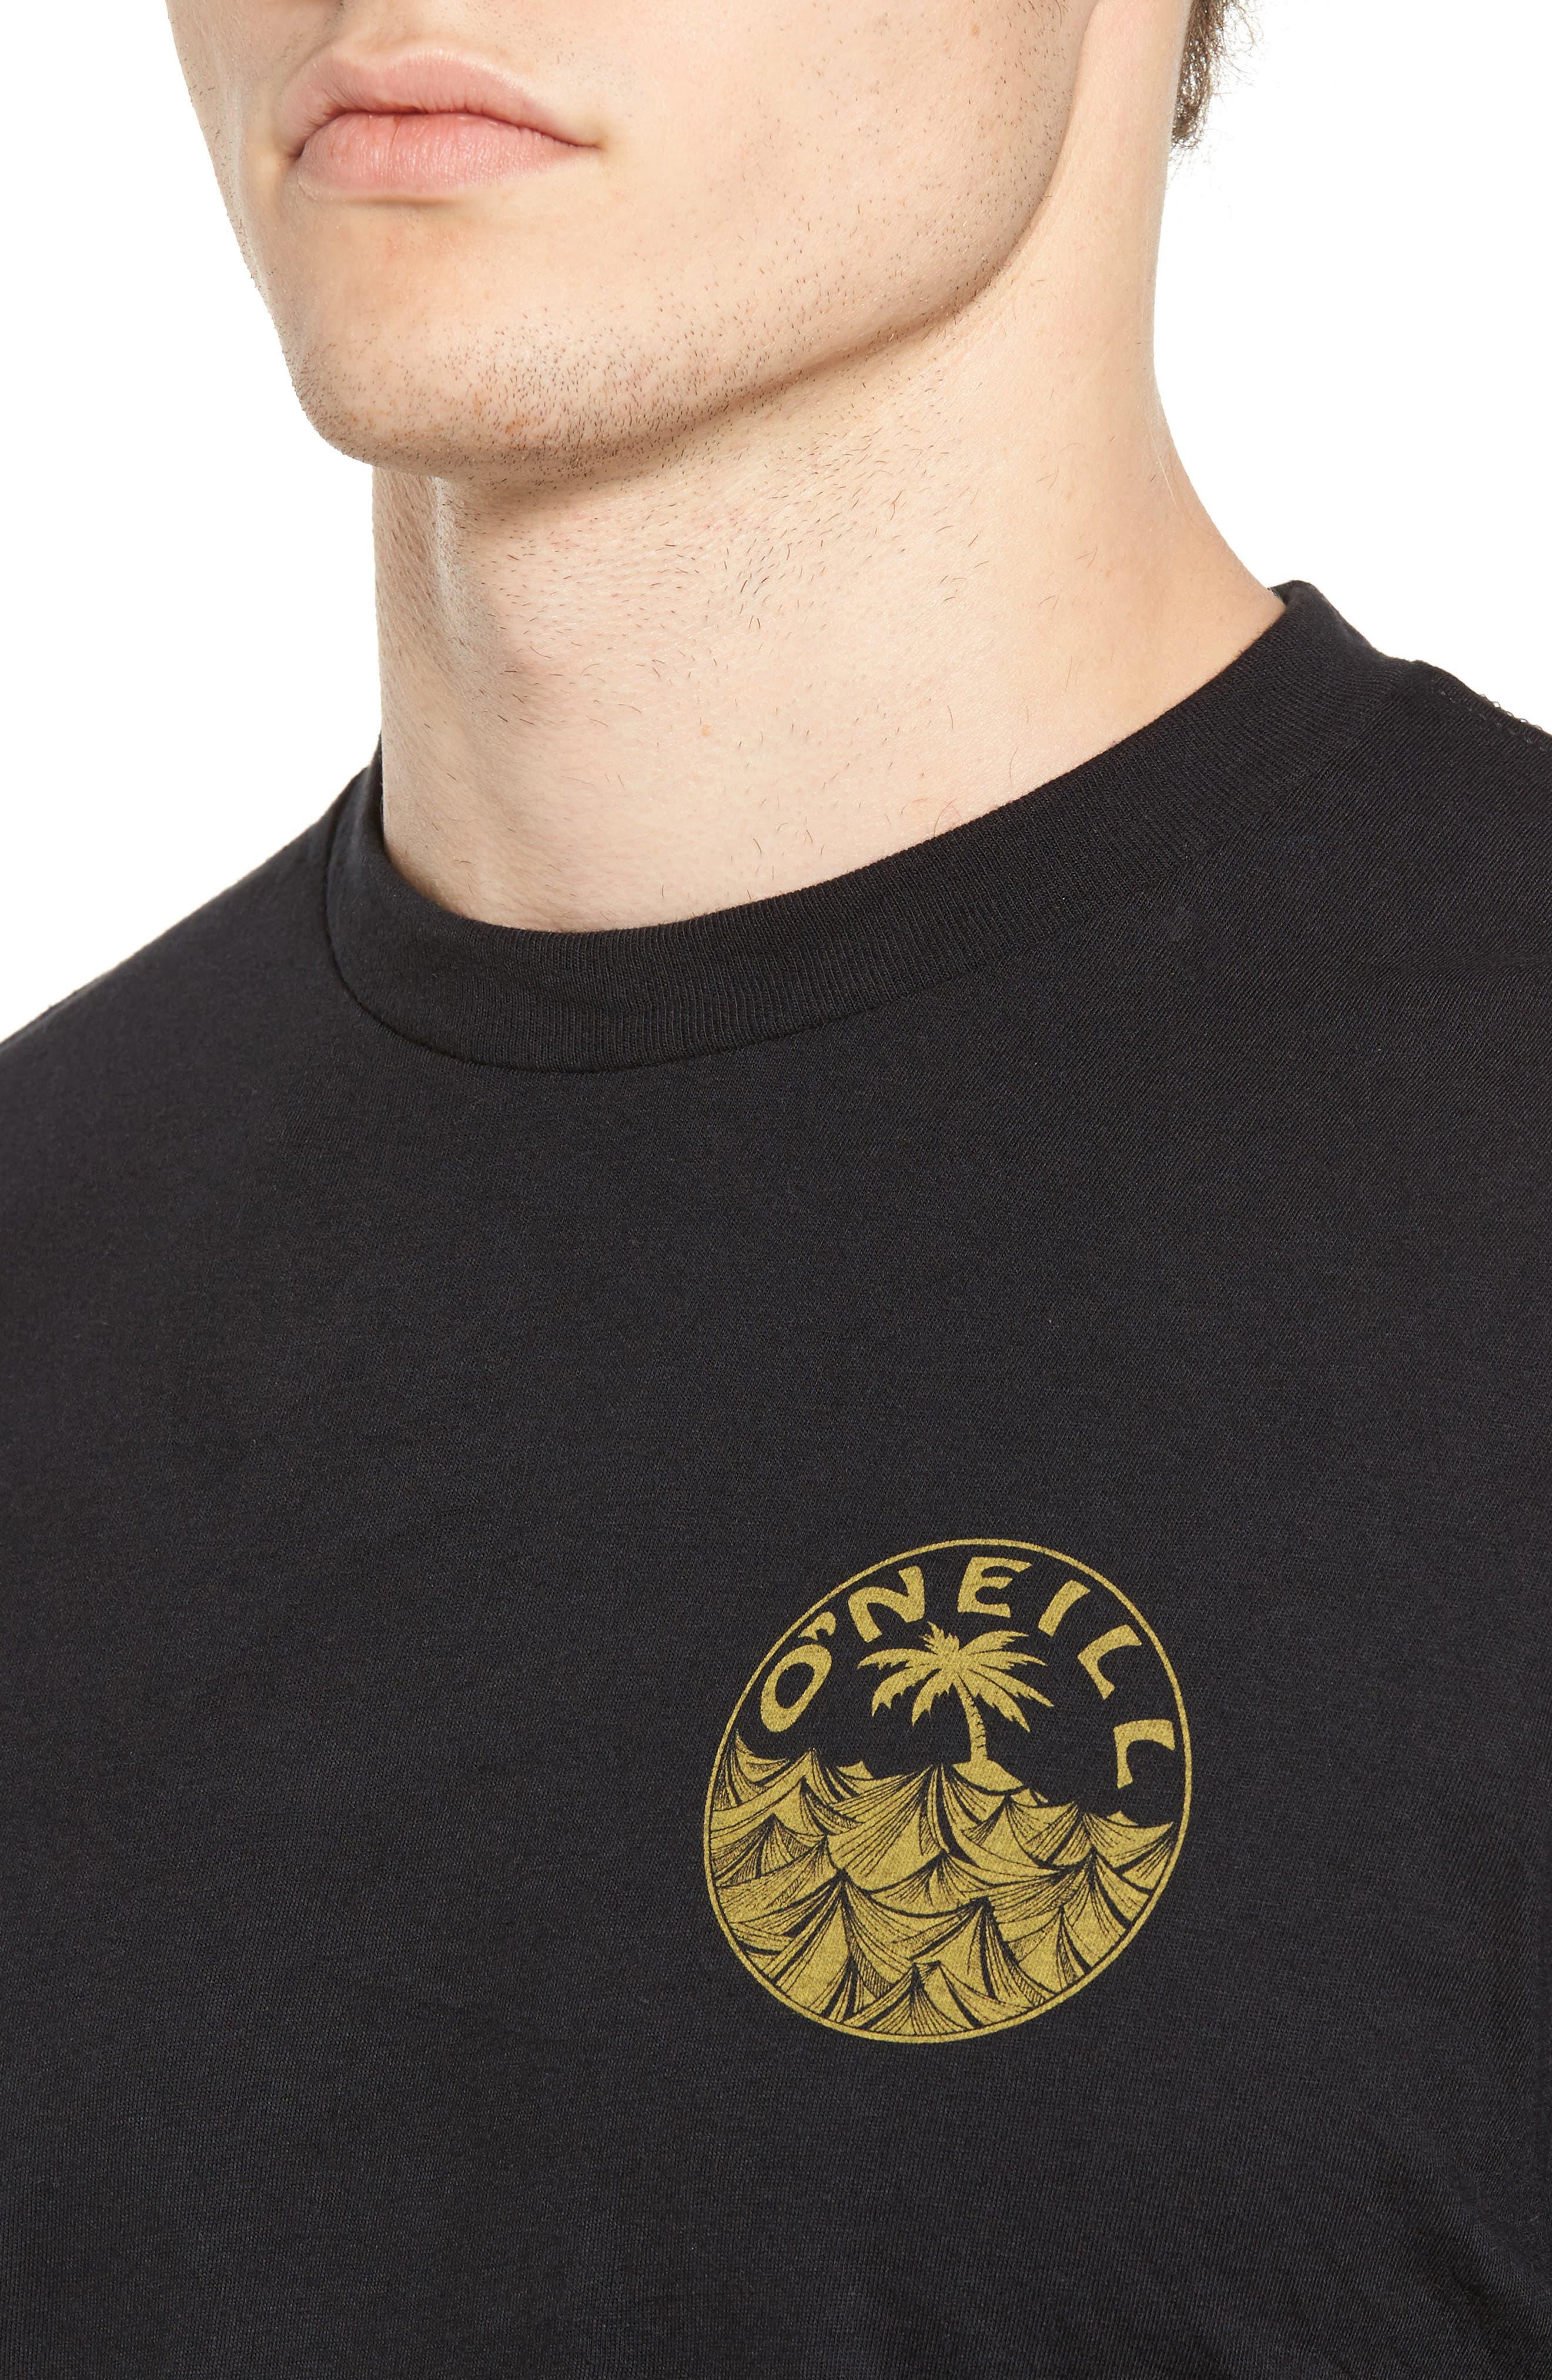 Waver Graphic T-Shirt,                             Alternate thumbnail 4, color,                             001